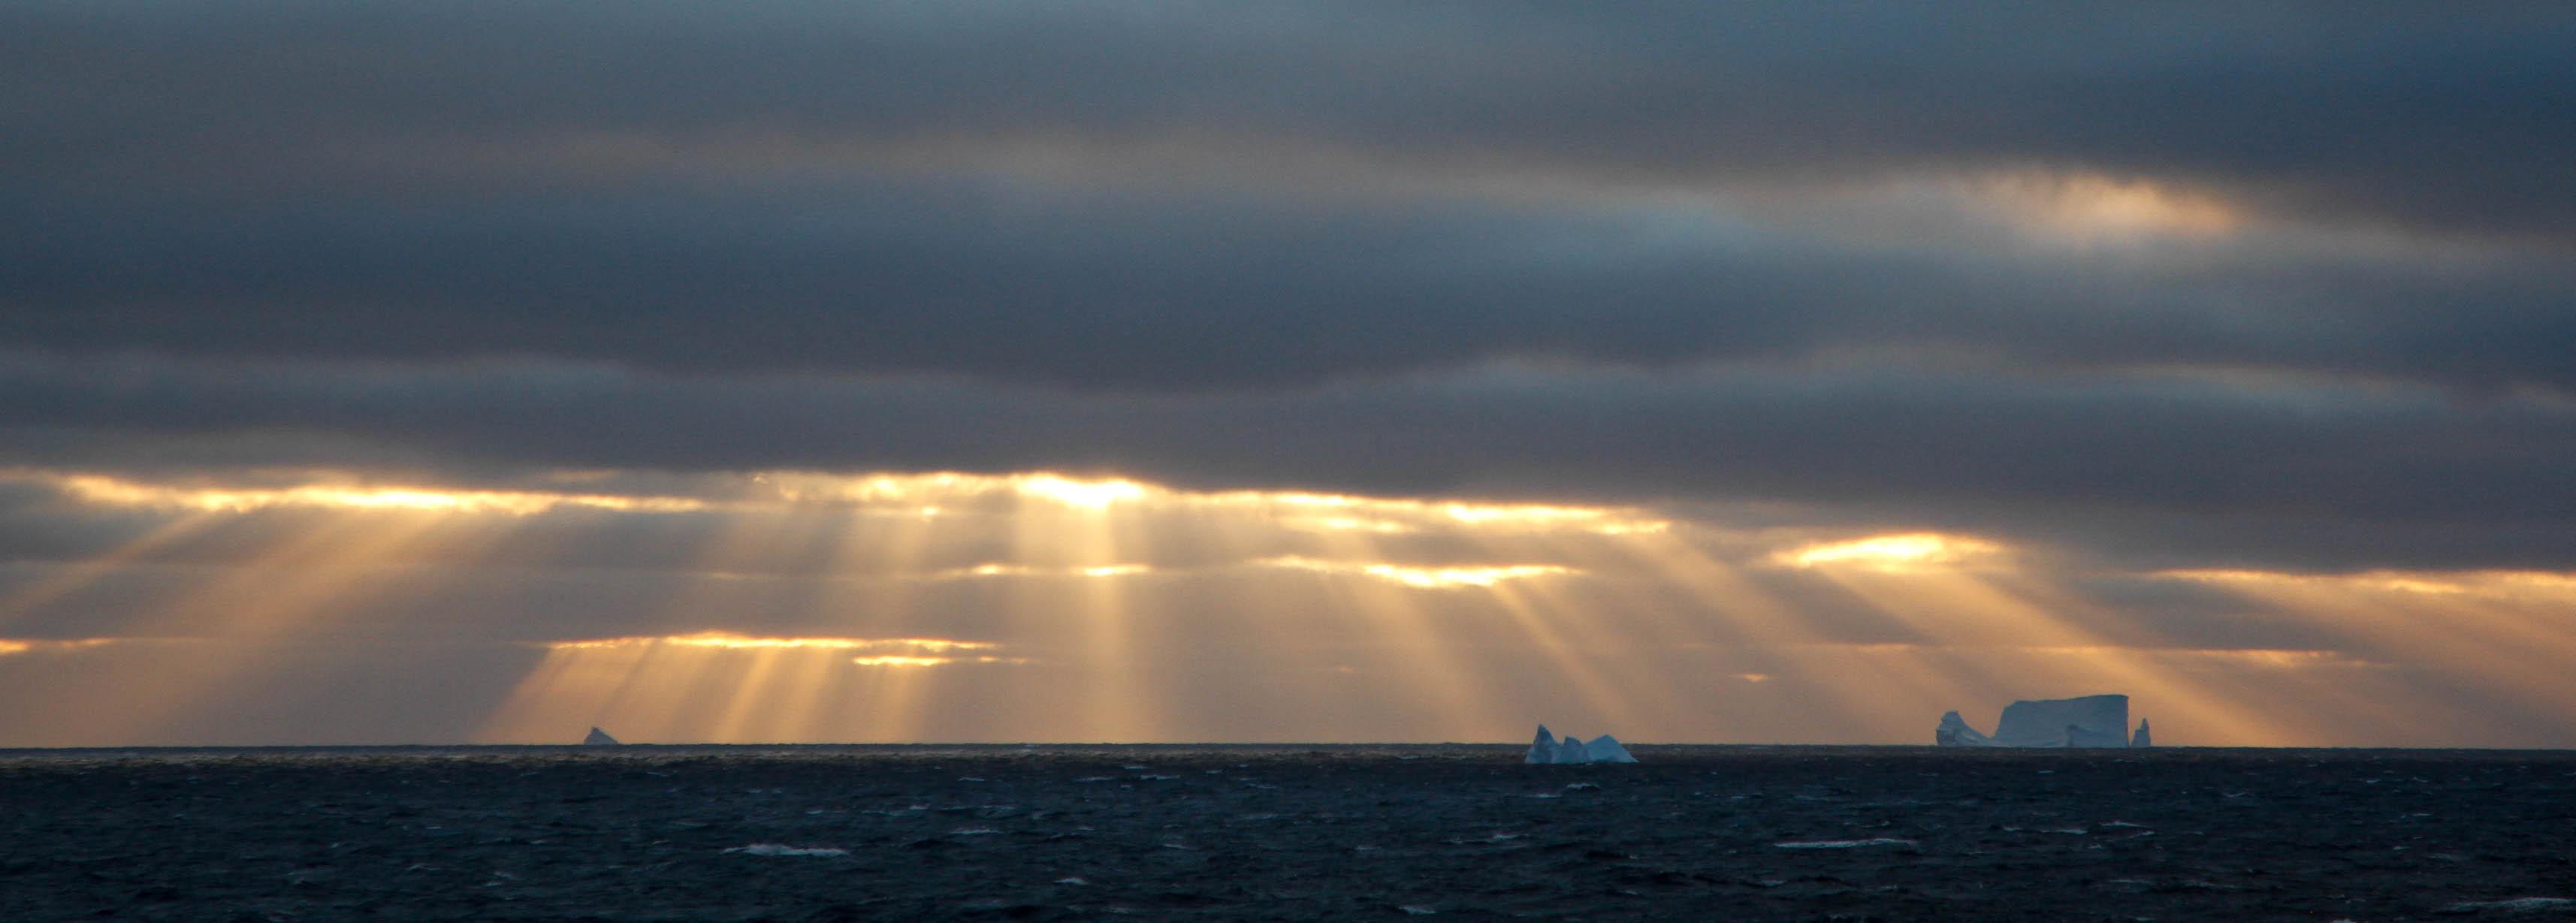 Baffin_Bay_sunset_pano_Daven_Hafey.jpg